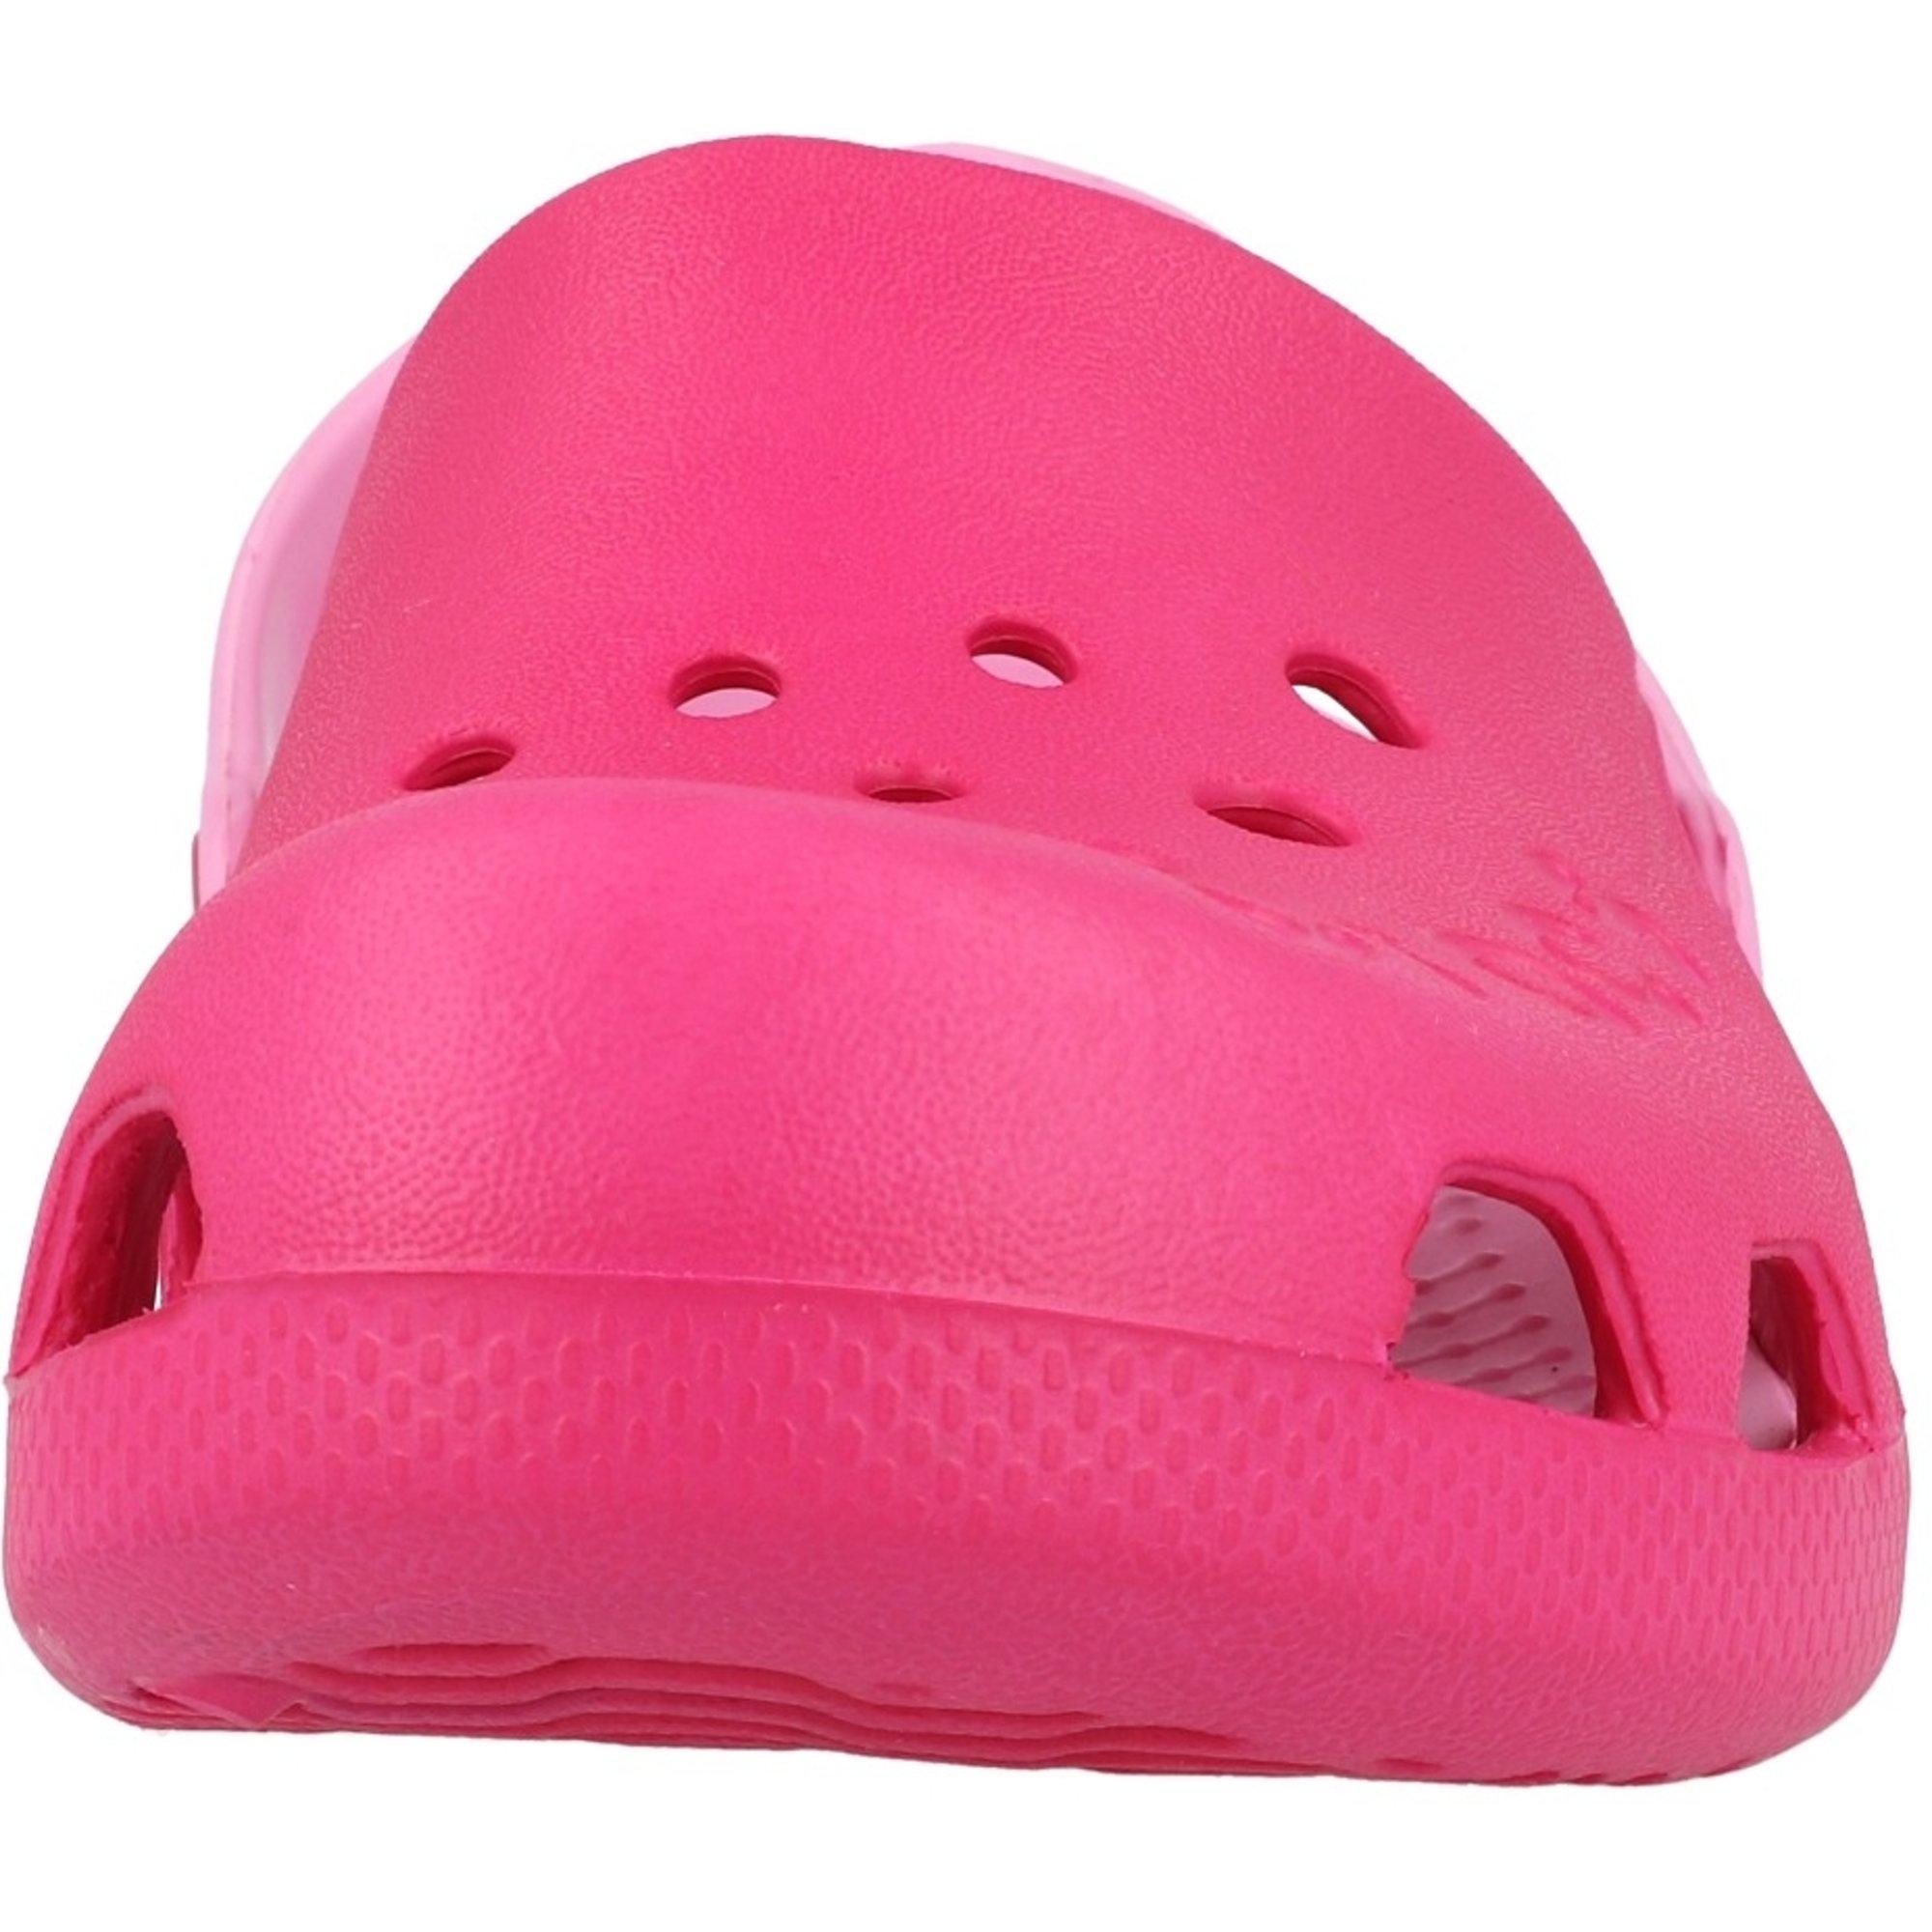 Crocs Electro Kids Candy Pink/Carnation Croslite